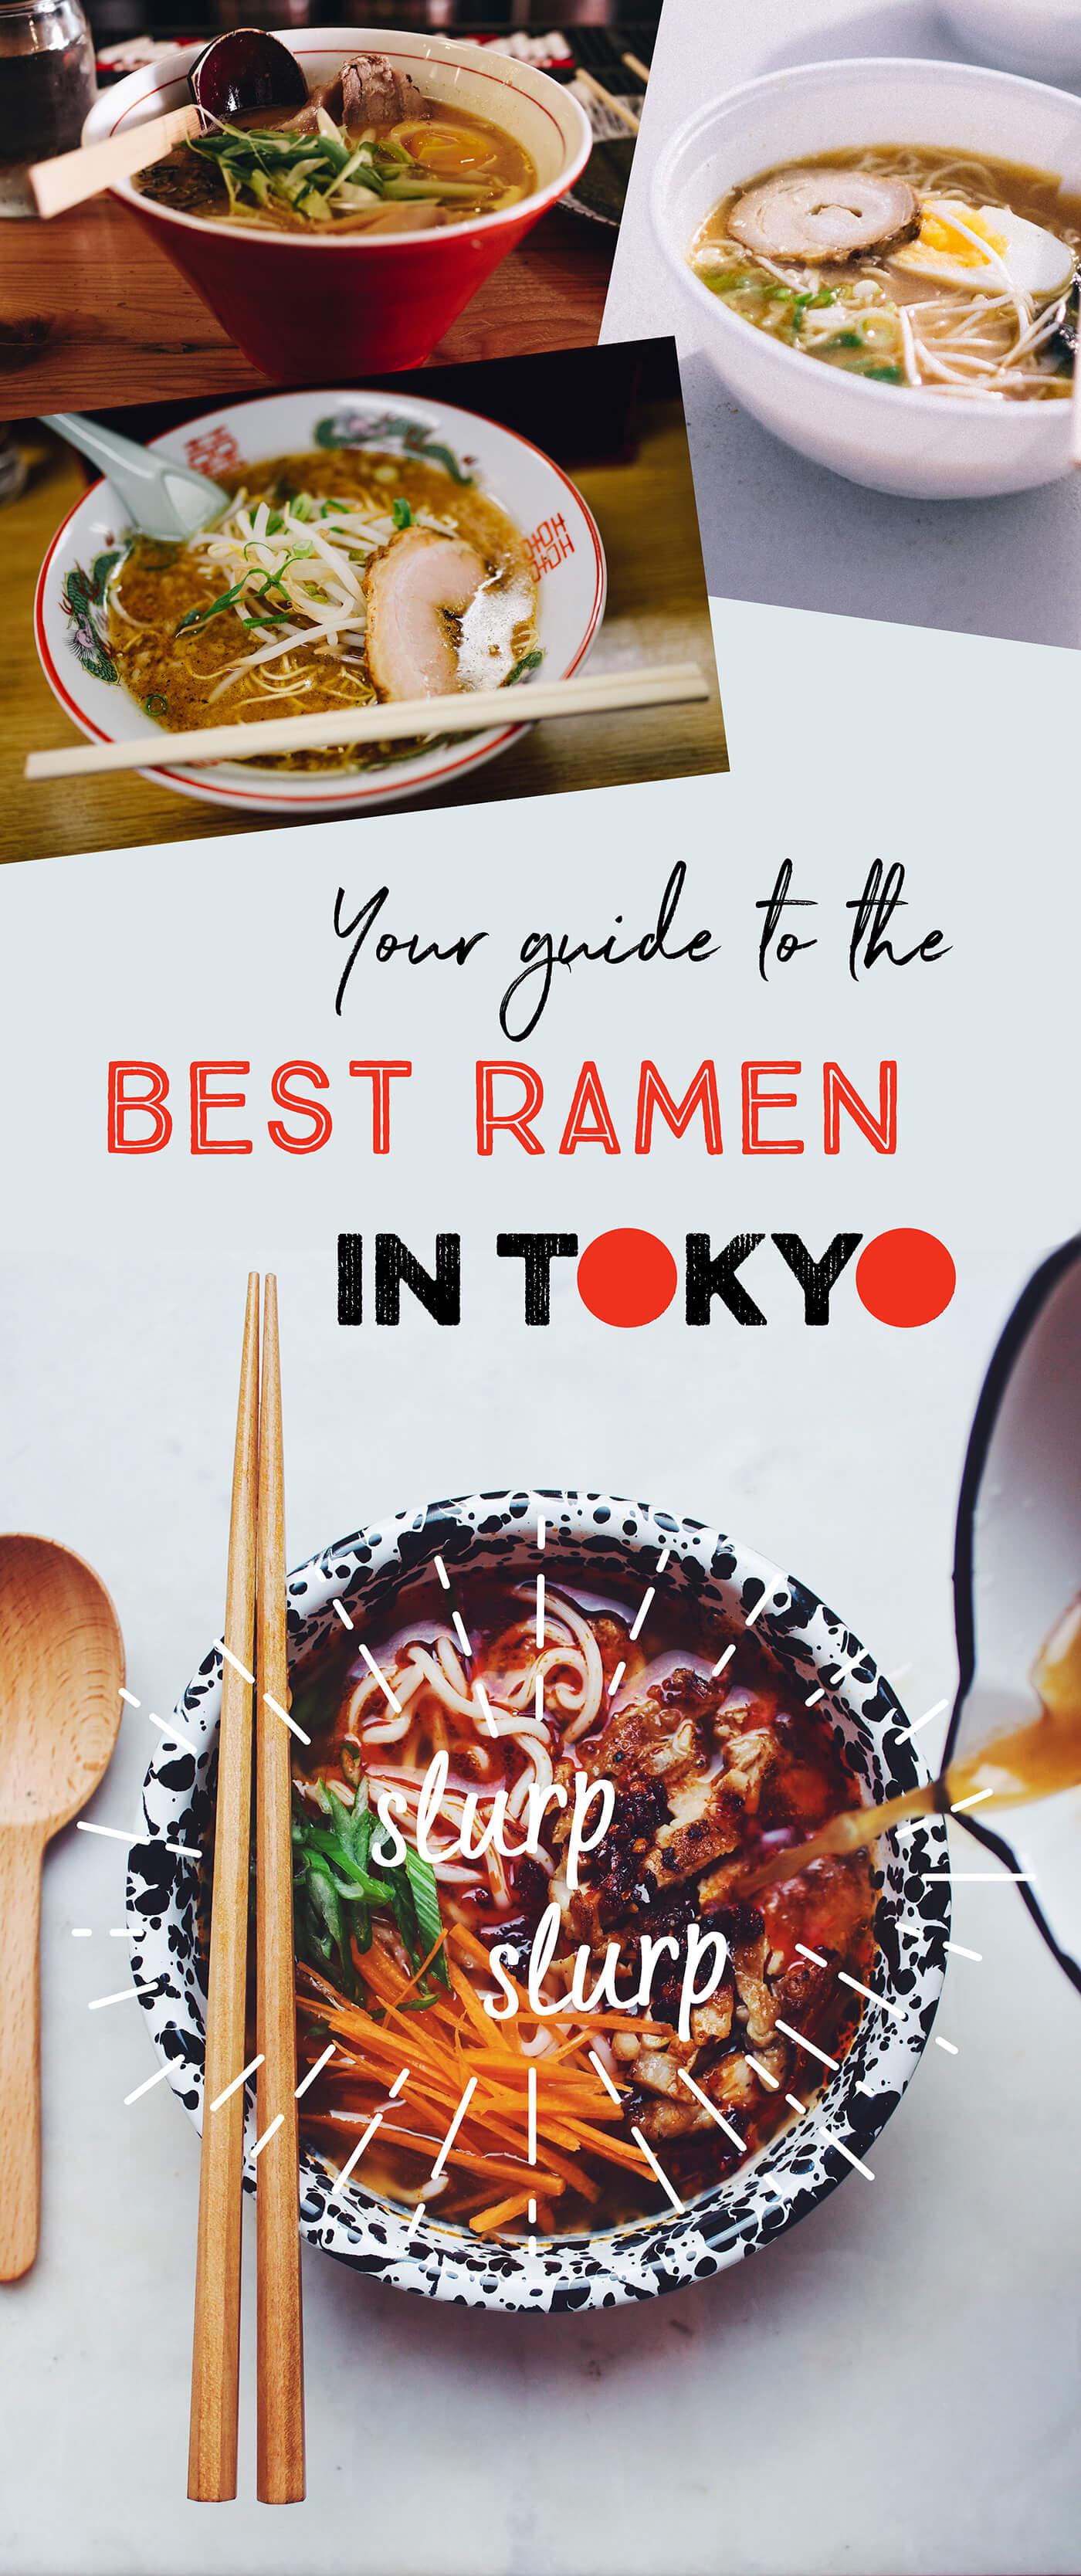 Best-Ramen-Tokyo.jpg